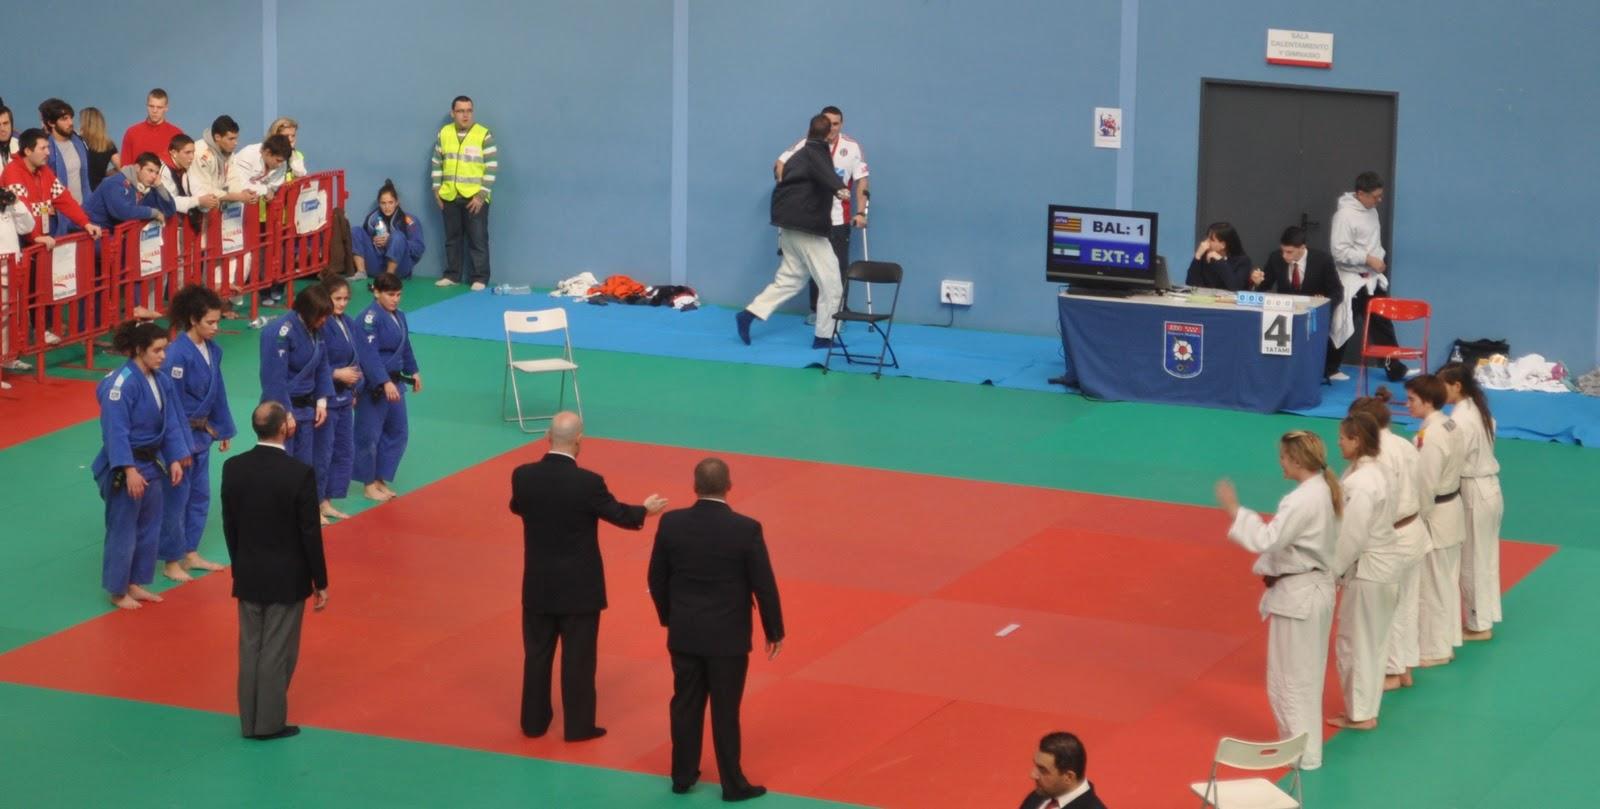 Extejudo vuelve la liga de judo nacional 1 jornada for Gimnasio villaviciosa de odon